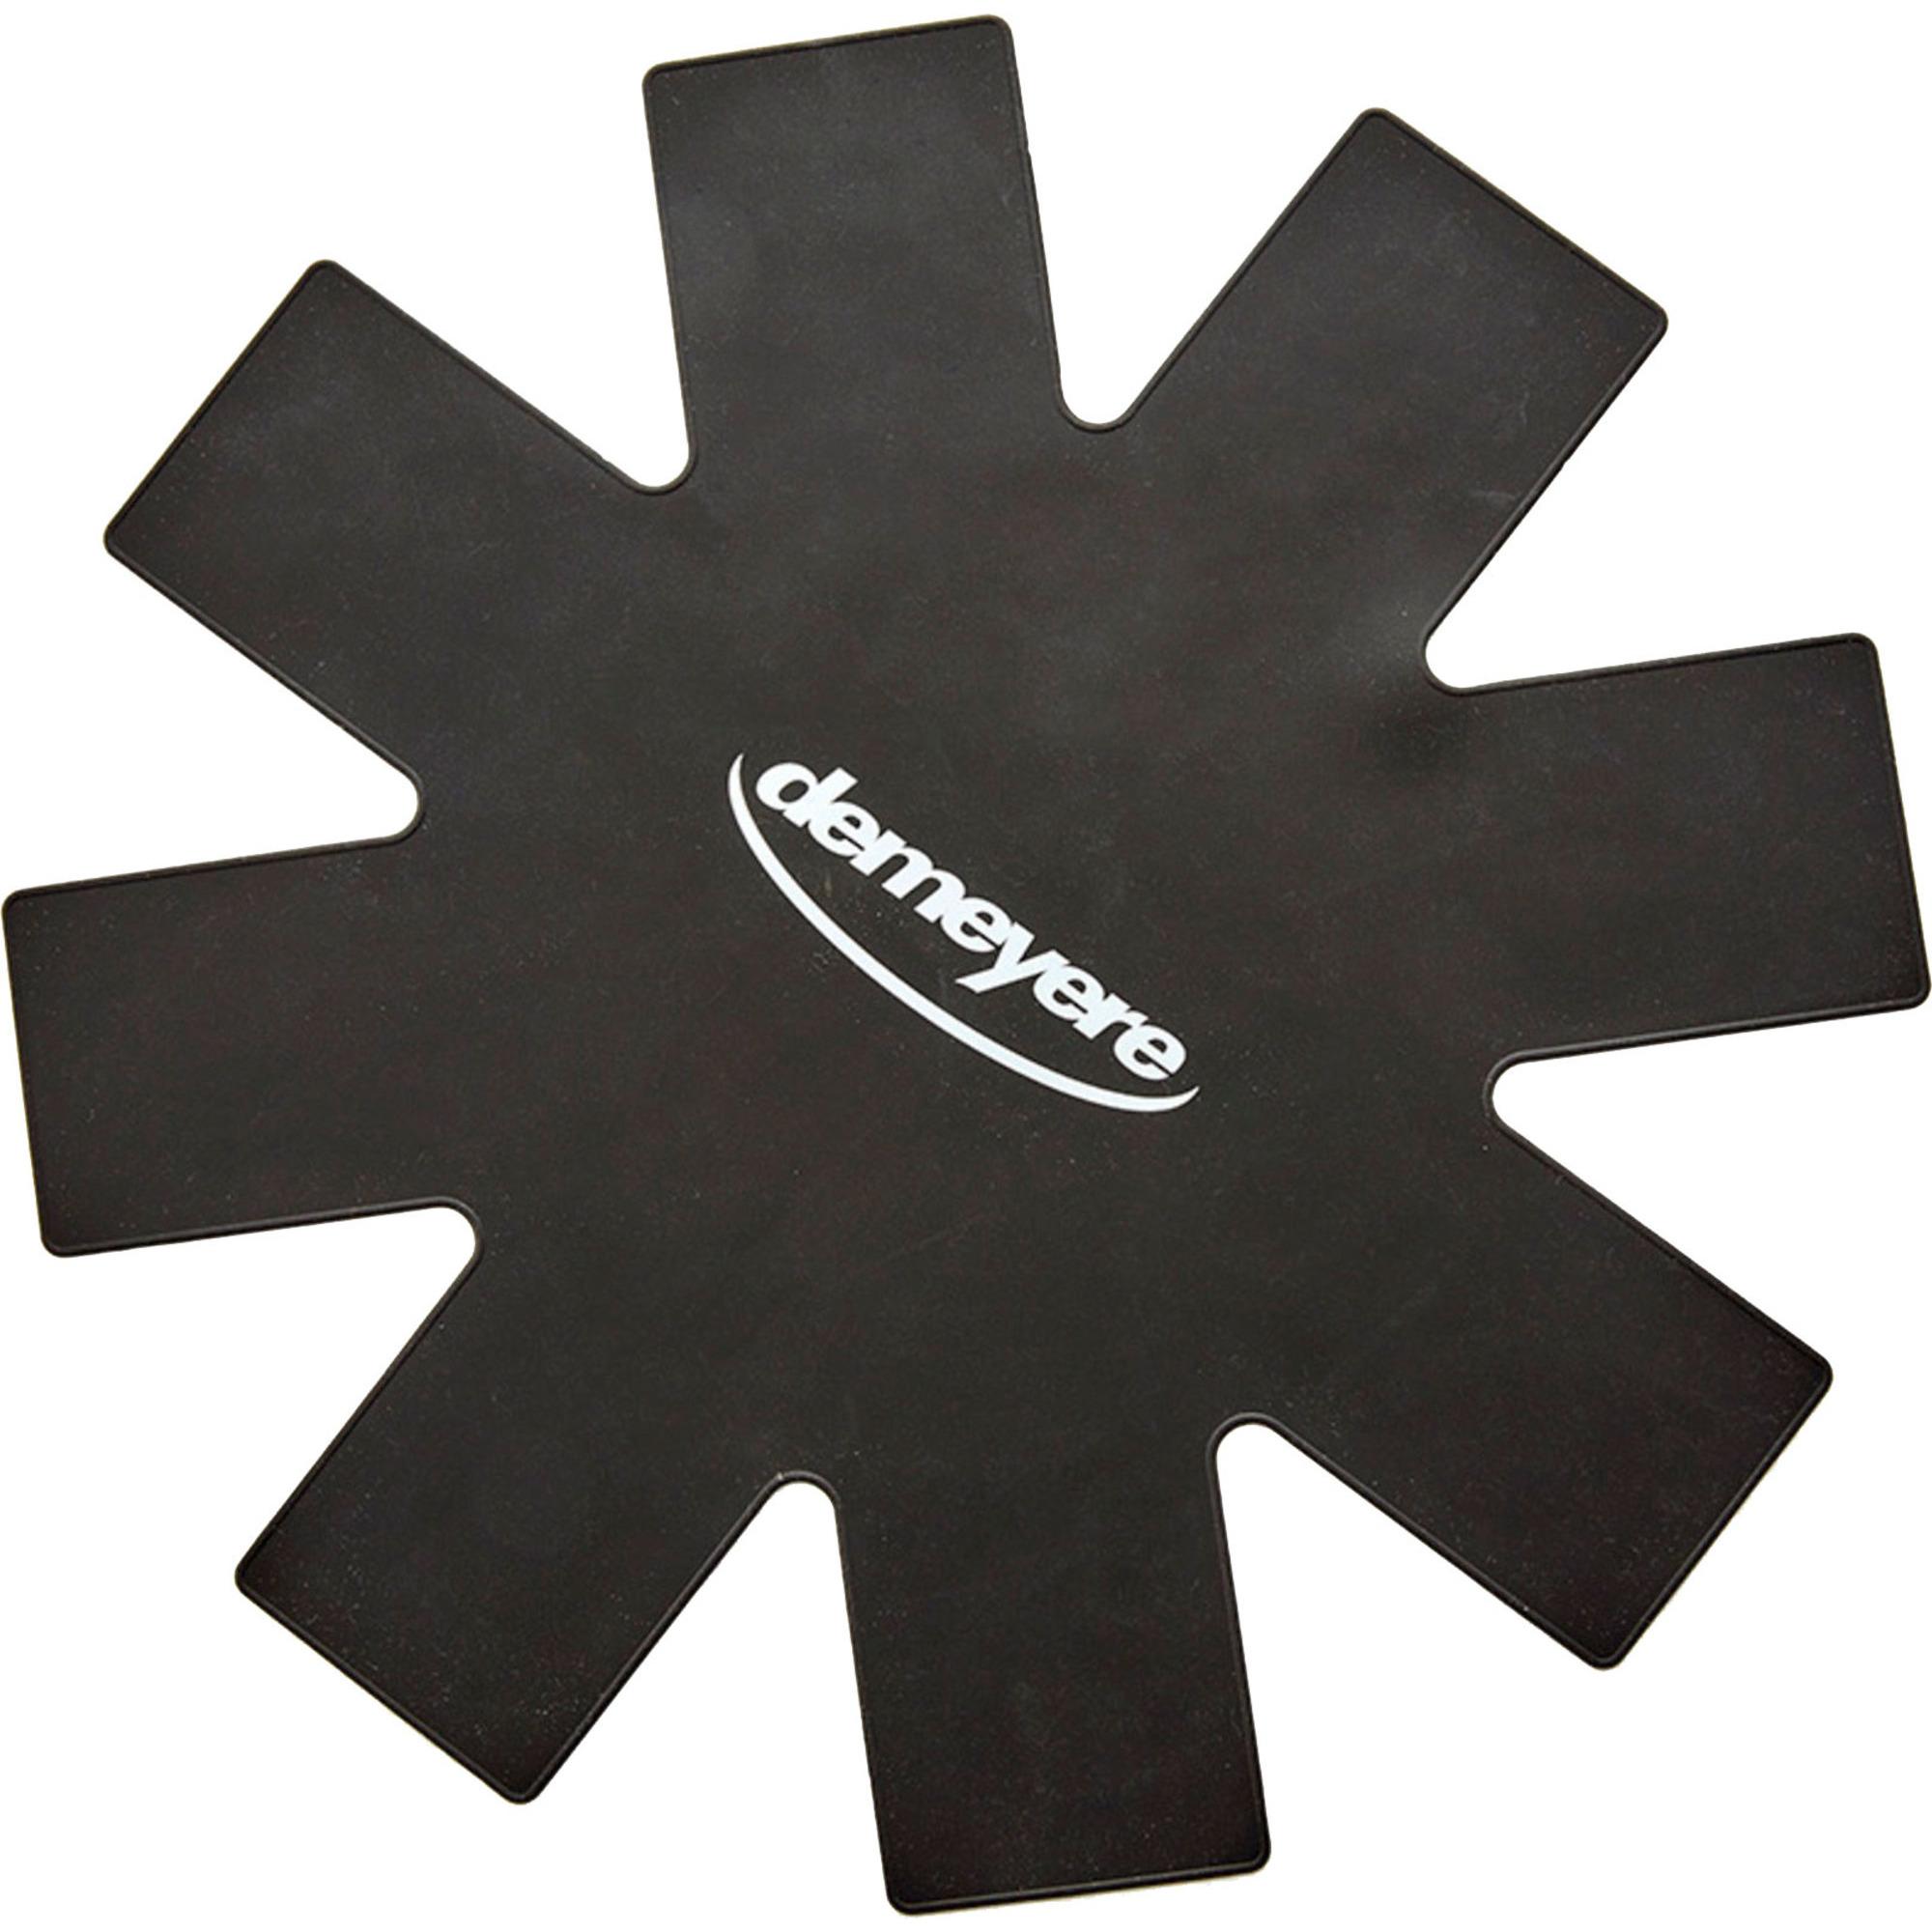 Demeyere Specialties Silikonunderlägg/Stekpanneskydd 2 pack Ø 40 cm